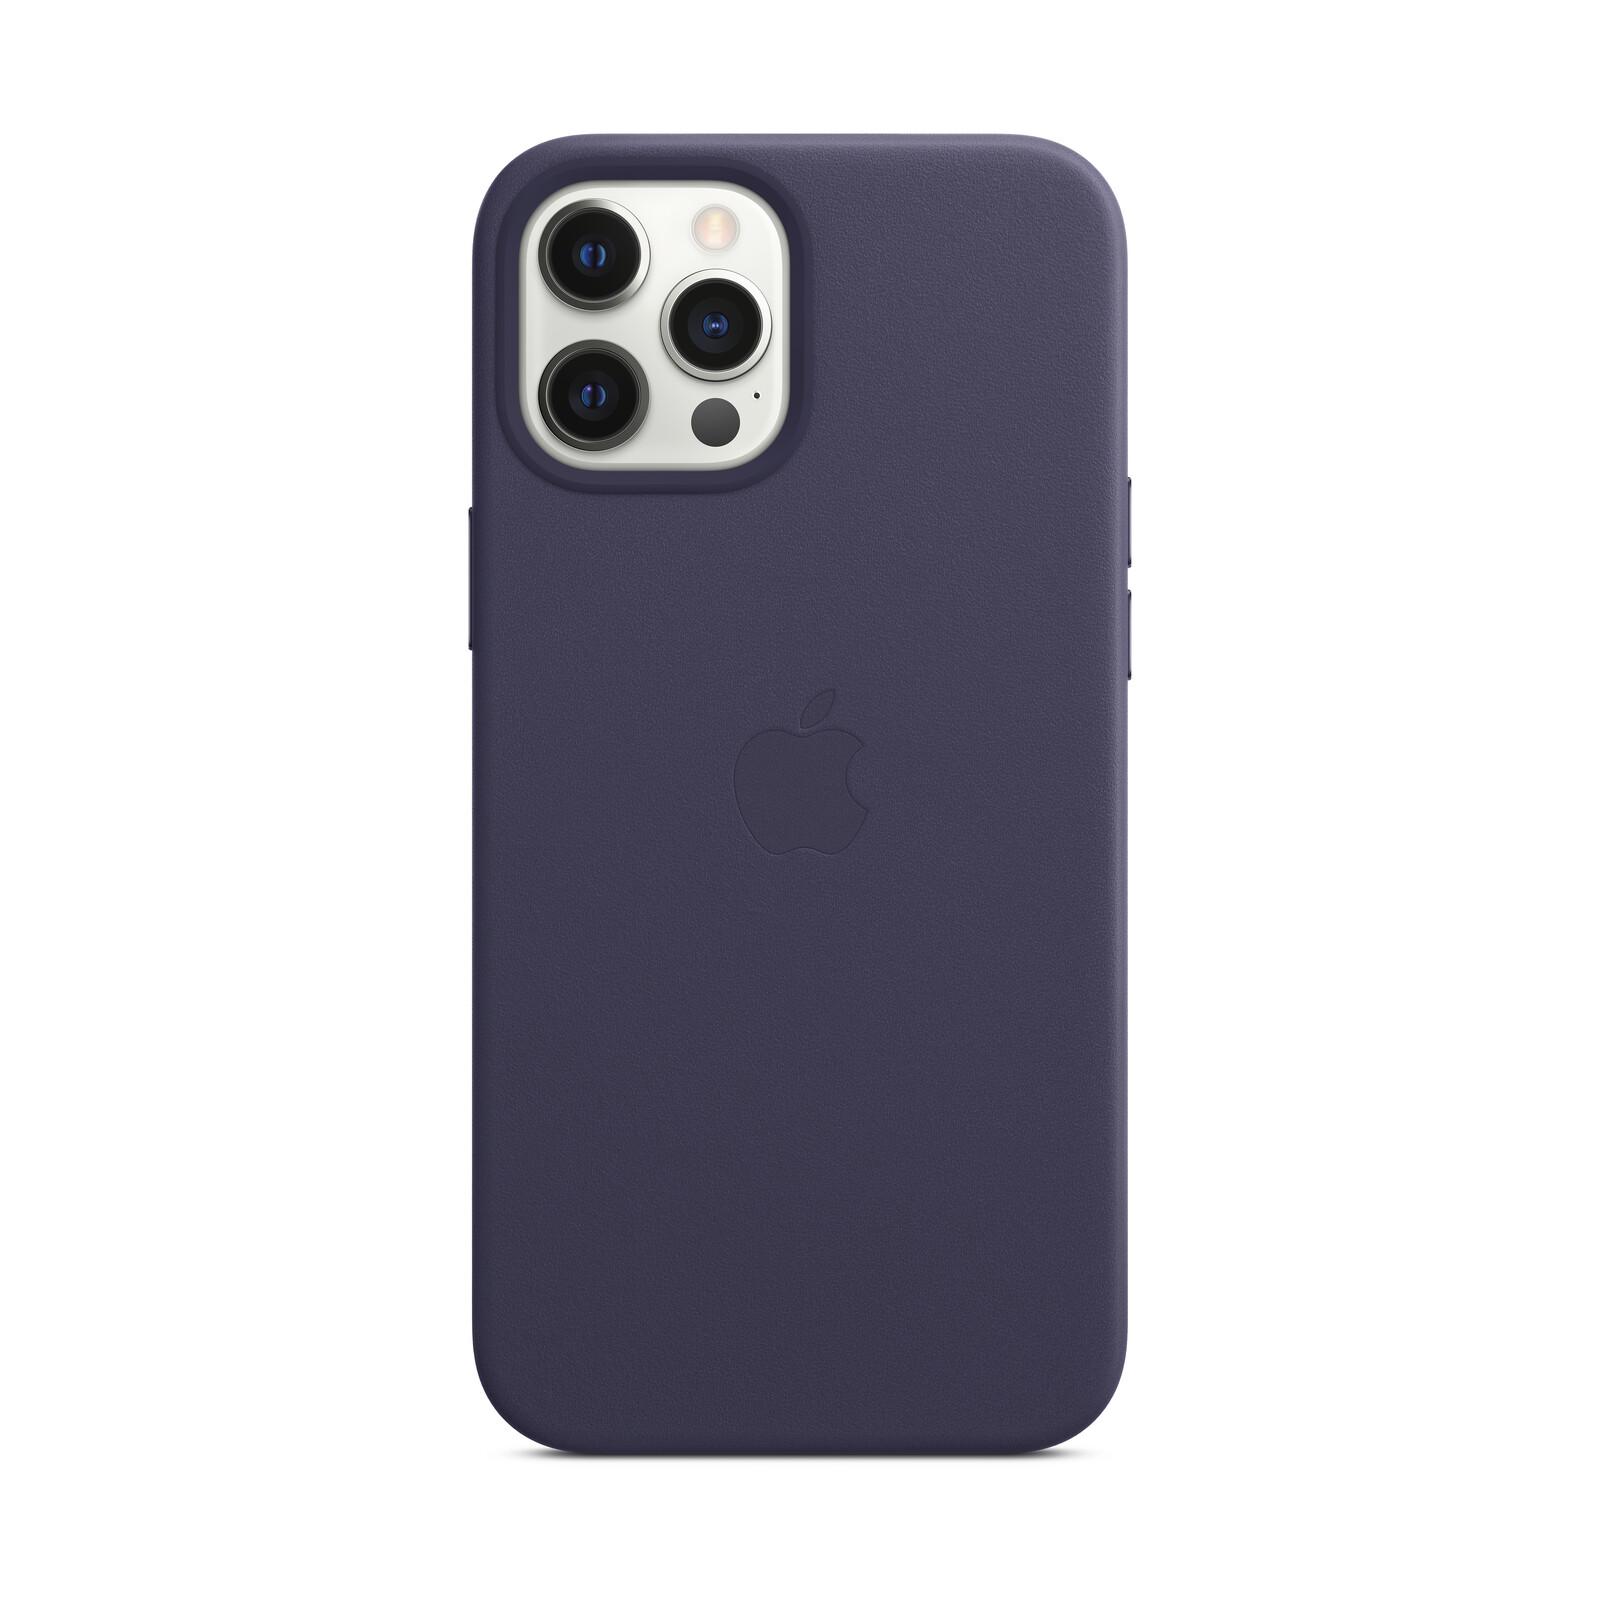 Apple iPhone 12 Pro Max Leder Case mit MagSafe dunkevoilett